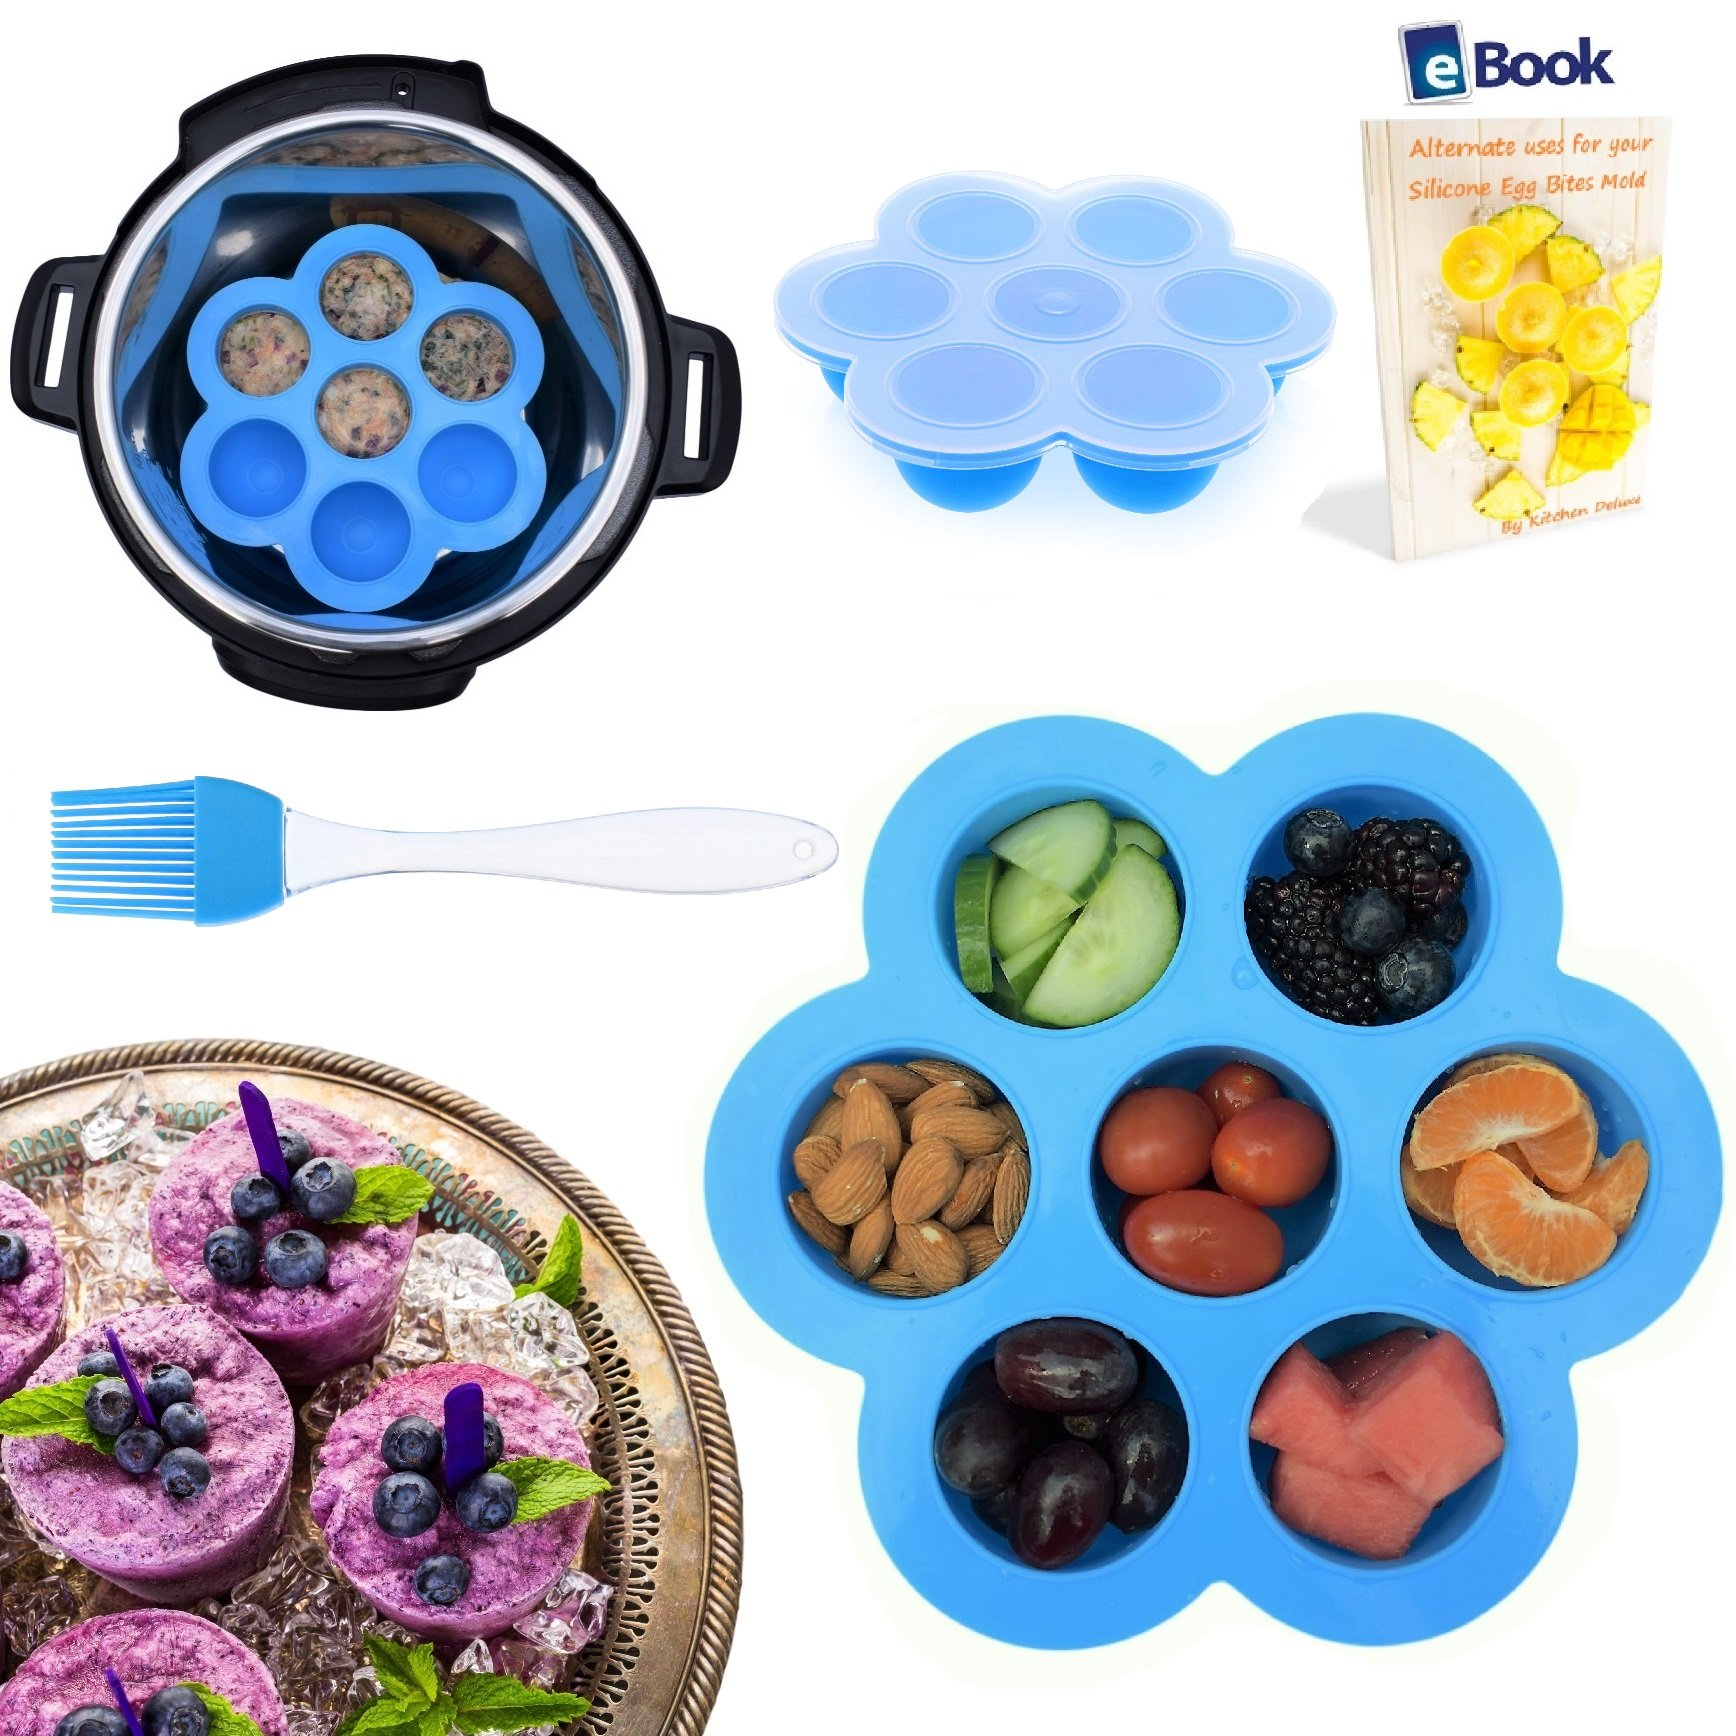 PREMIUM Silicone Egg Bites Molds - BEST Bundle - Fits Instant Pot Pressure Cooker 5,6 Qt & 8 Quart - BONUS Accessories - Pastry Brush + eBook | For Instapot, Baby Food |Storage Container |Freezer Tray